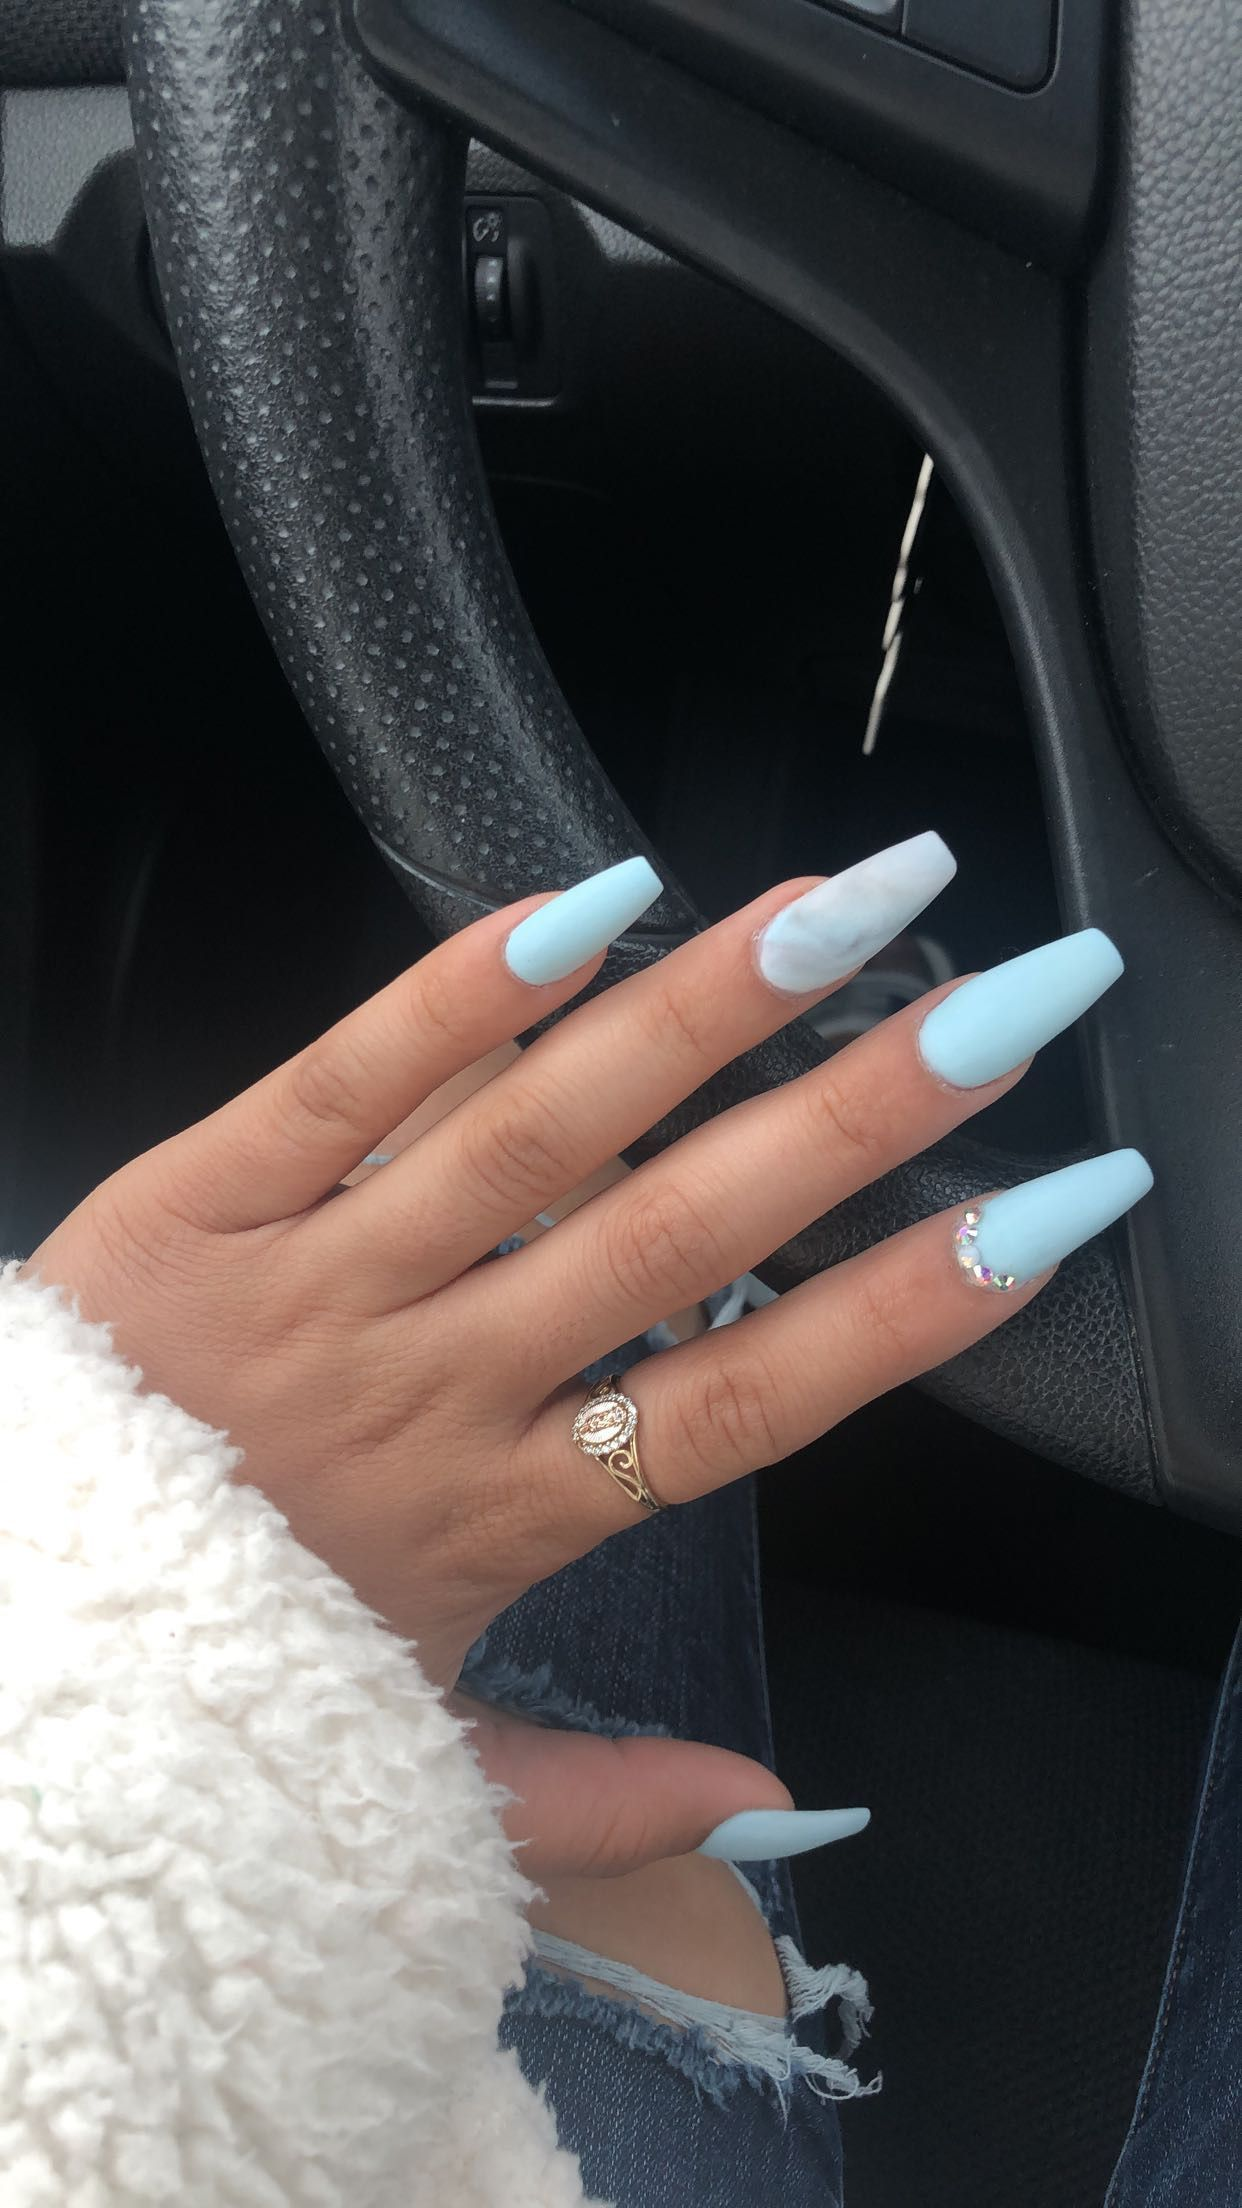 Acrylic Nails Short Acrylic Nails Royal Blue With A Sparkling Accent Acrylic Nails Short Square Acrylic Nails Square Acrylic Nails Blue Glitter Nails